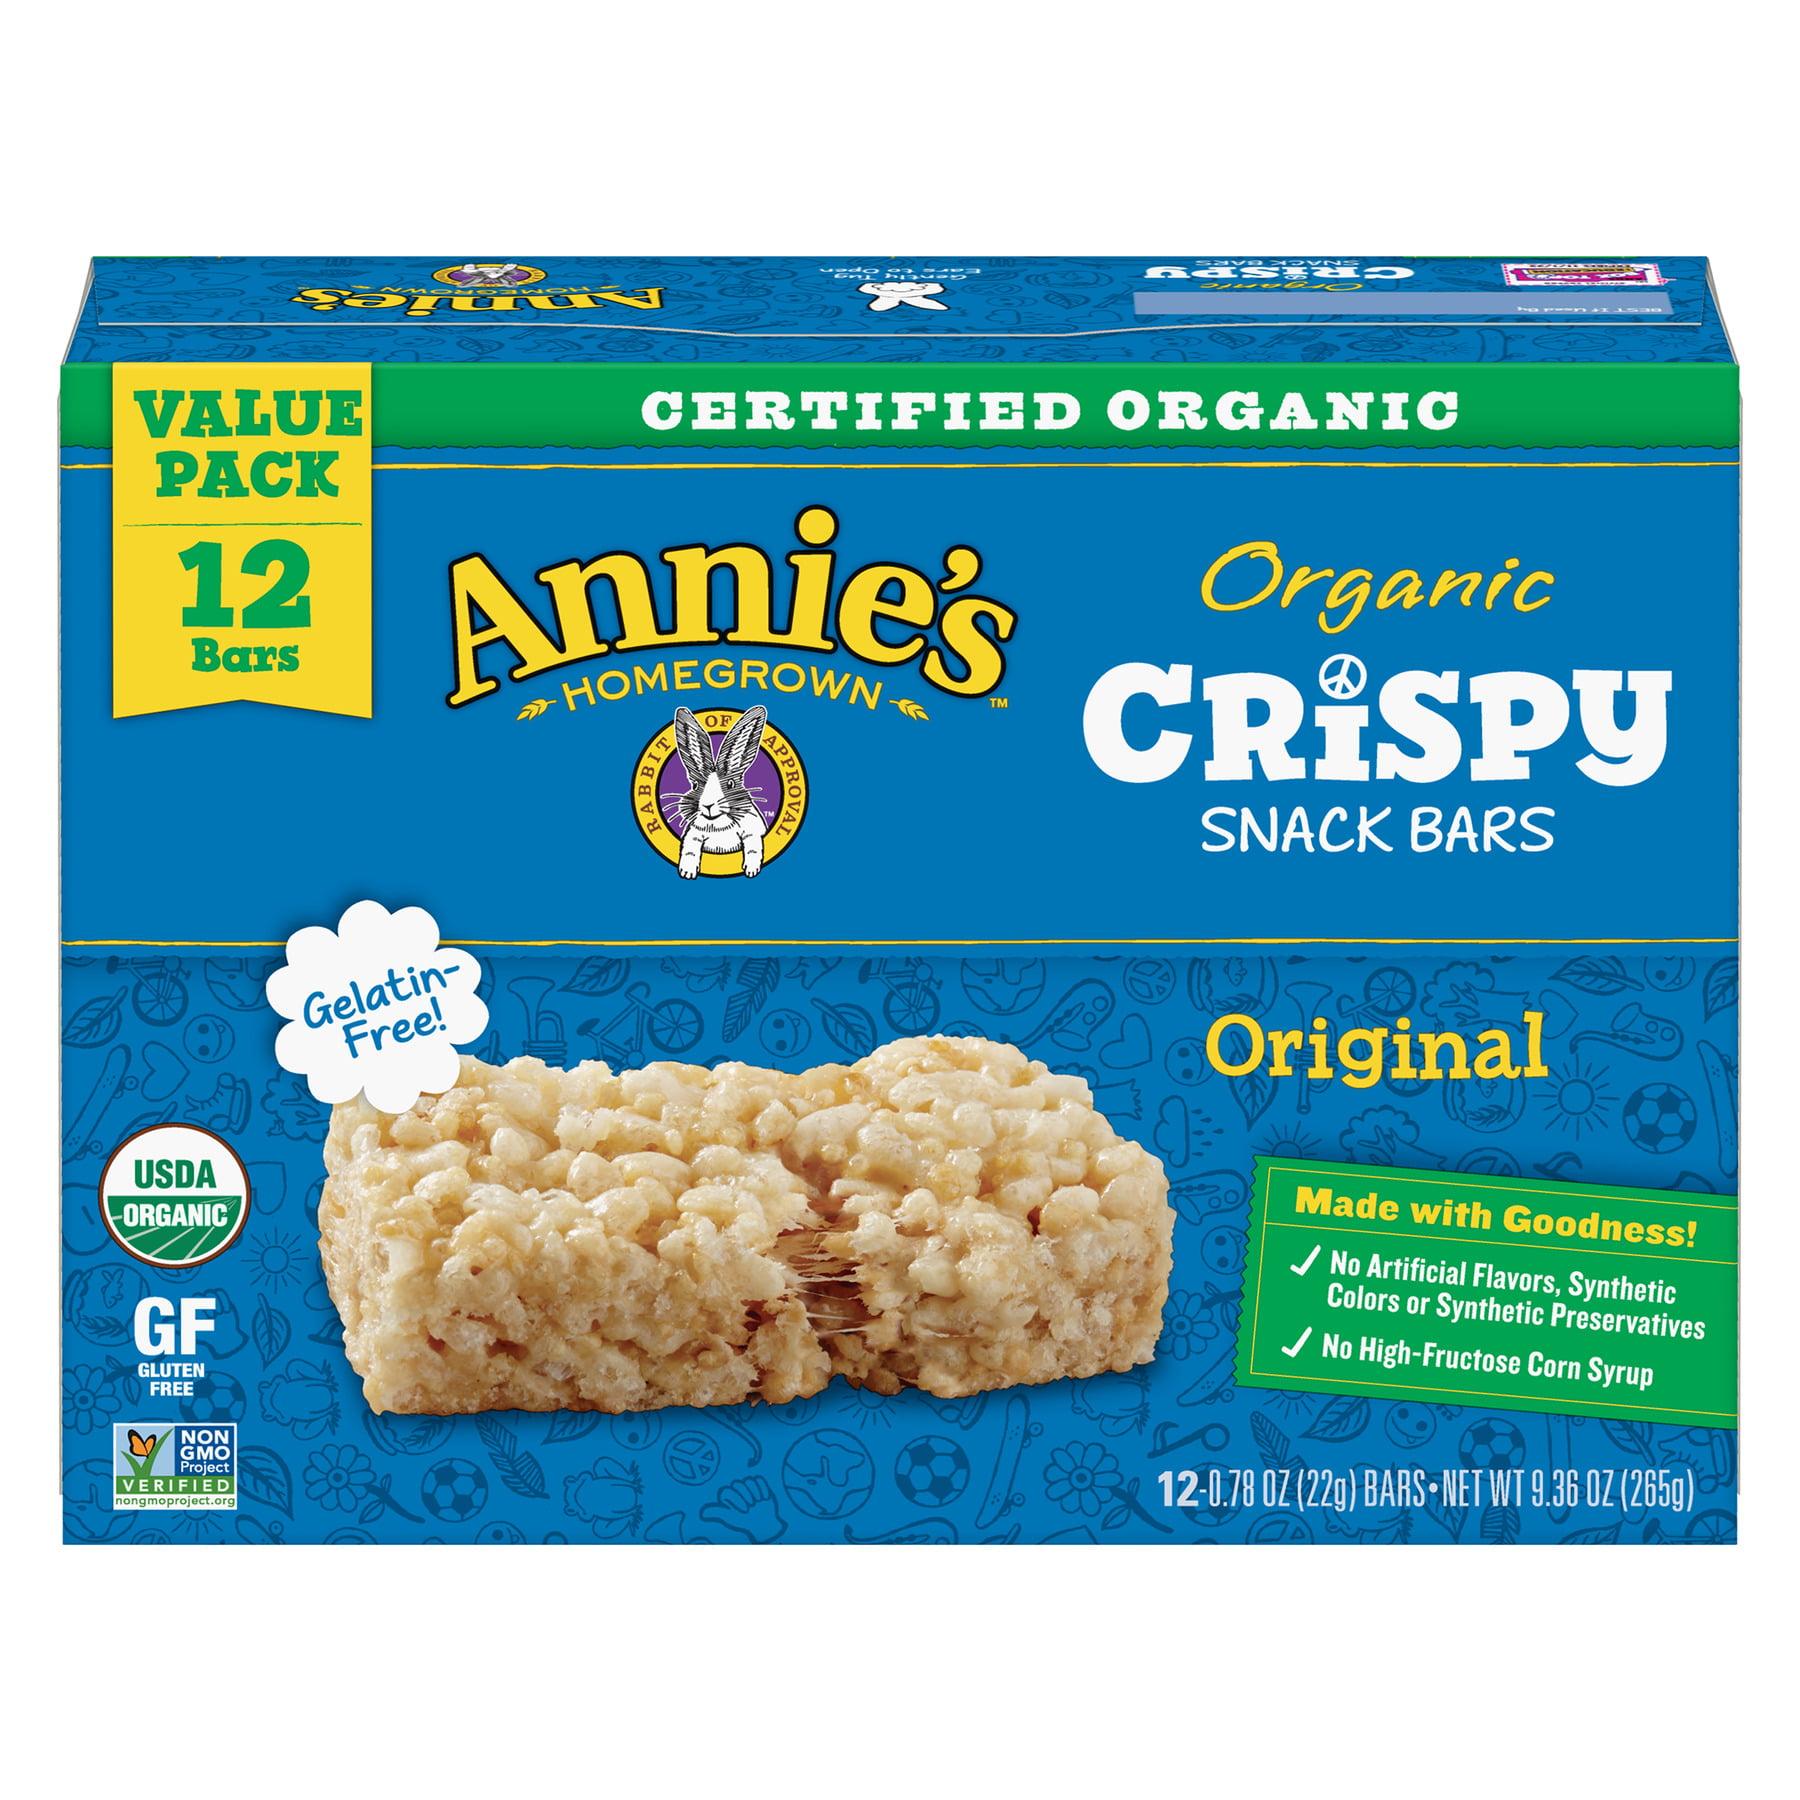 Annie's Organic Crispy Snack Bars Original Value Pack, 12 ct, 9.36 oz